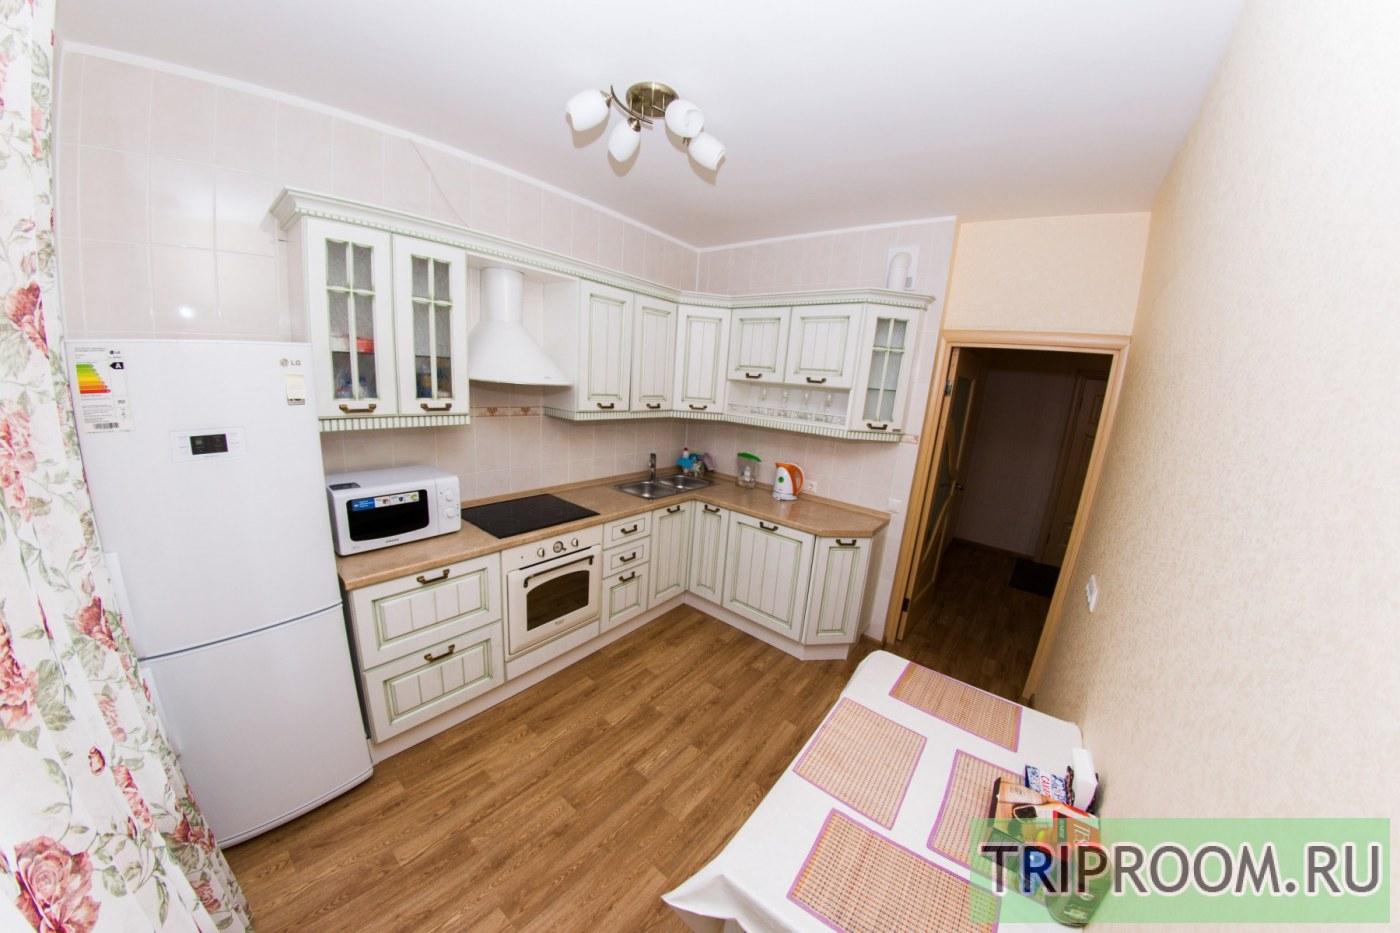 1-комнатная квартира посуточно (вариант № 39814), ул. Ленинский проспект, фото № 10